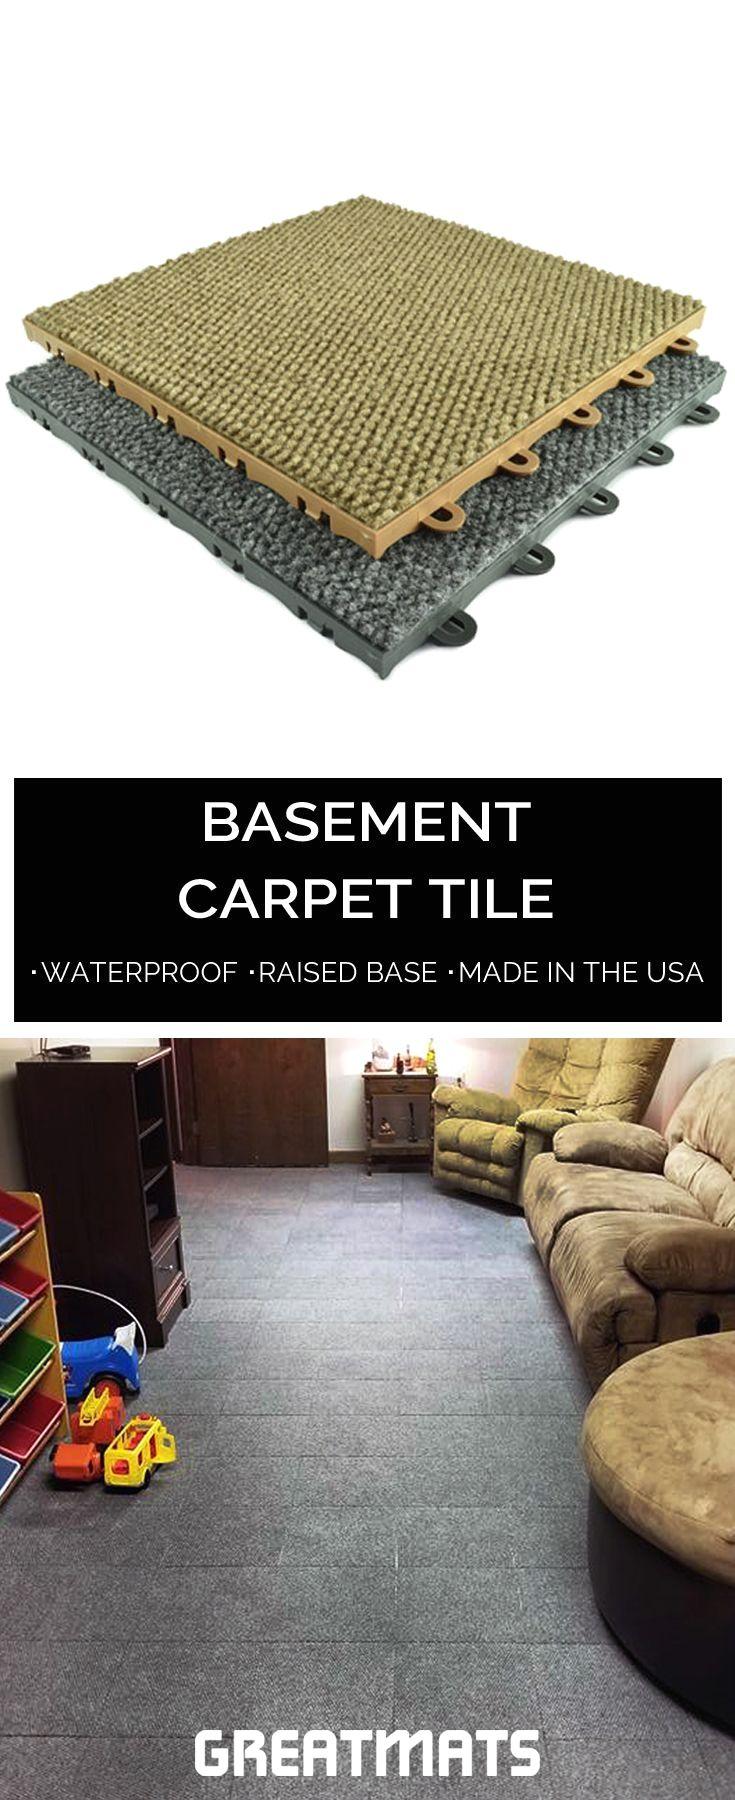 Basement Modular Carpet Tiles With A Raised Lock Togther Base Carpet Tiles Basement Carpet Tiles For Basement Basement Carpet